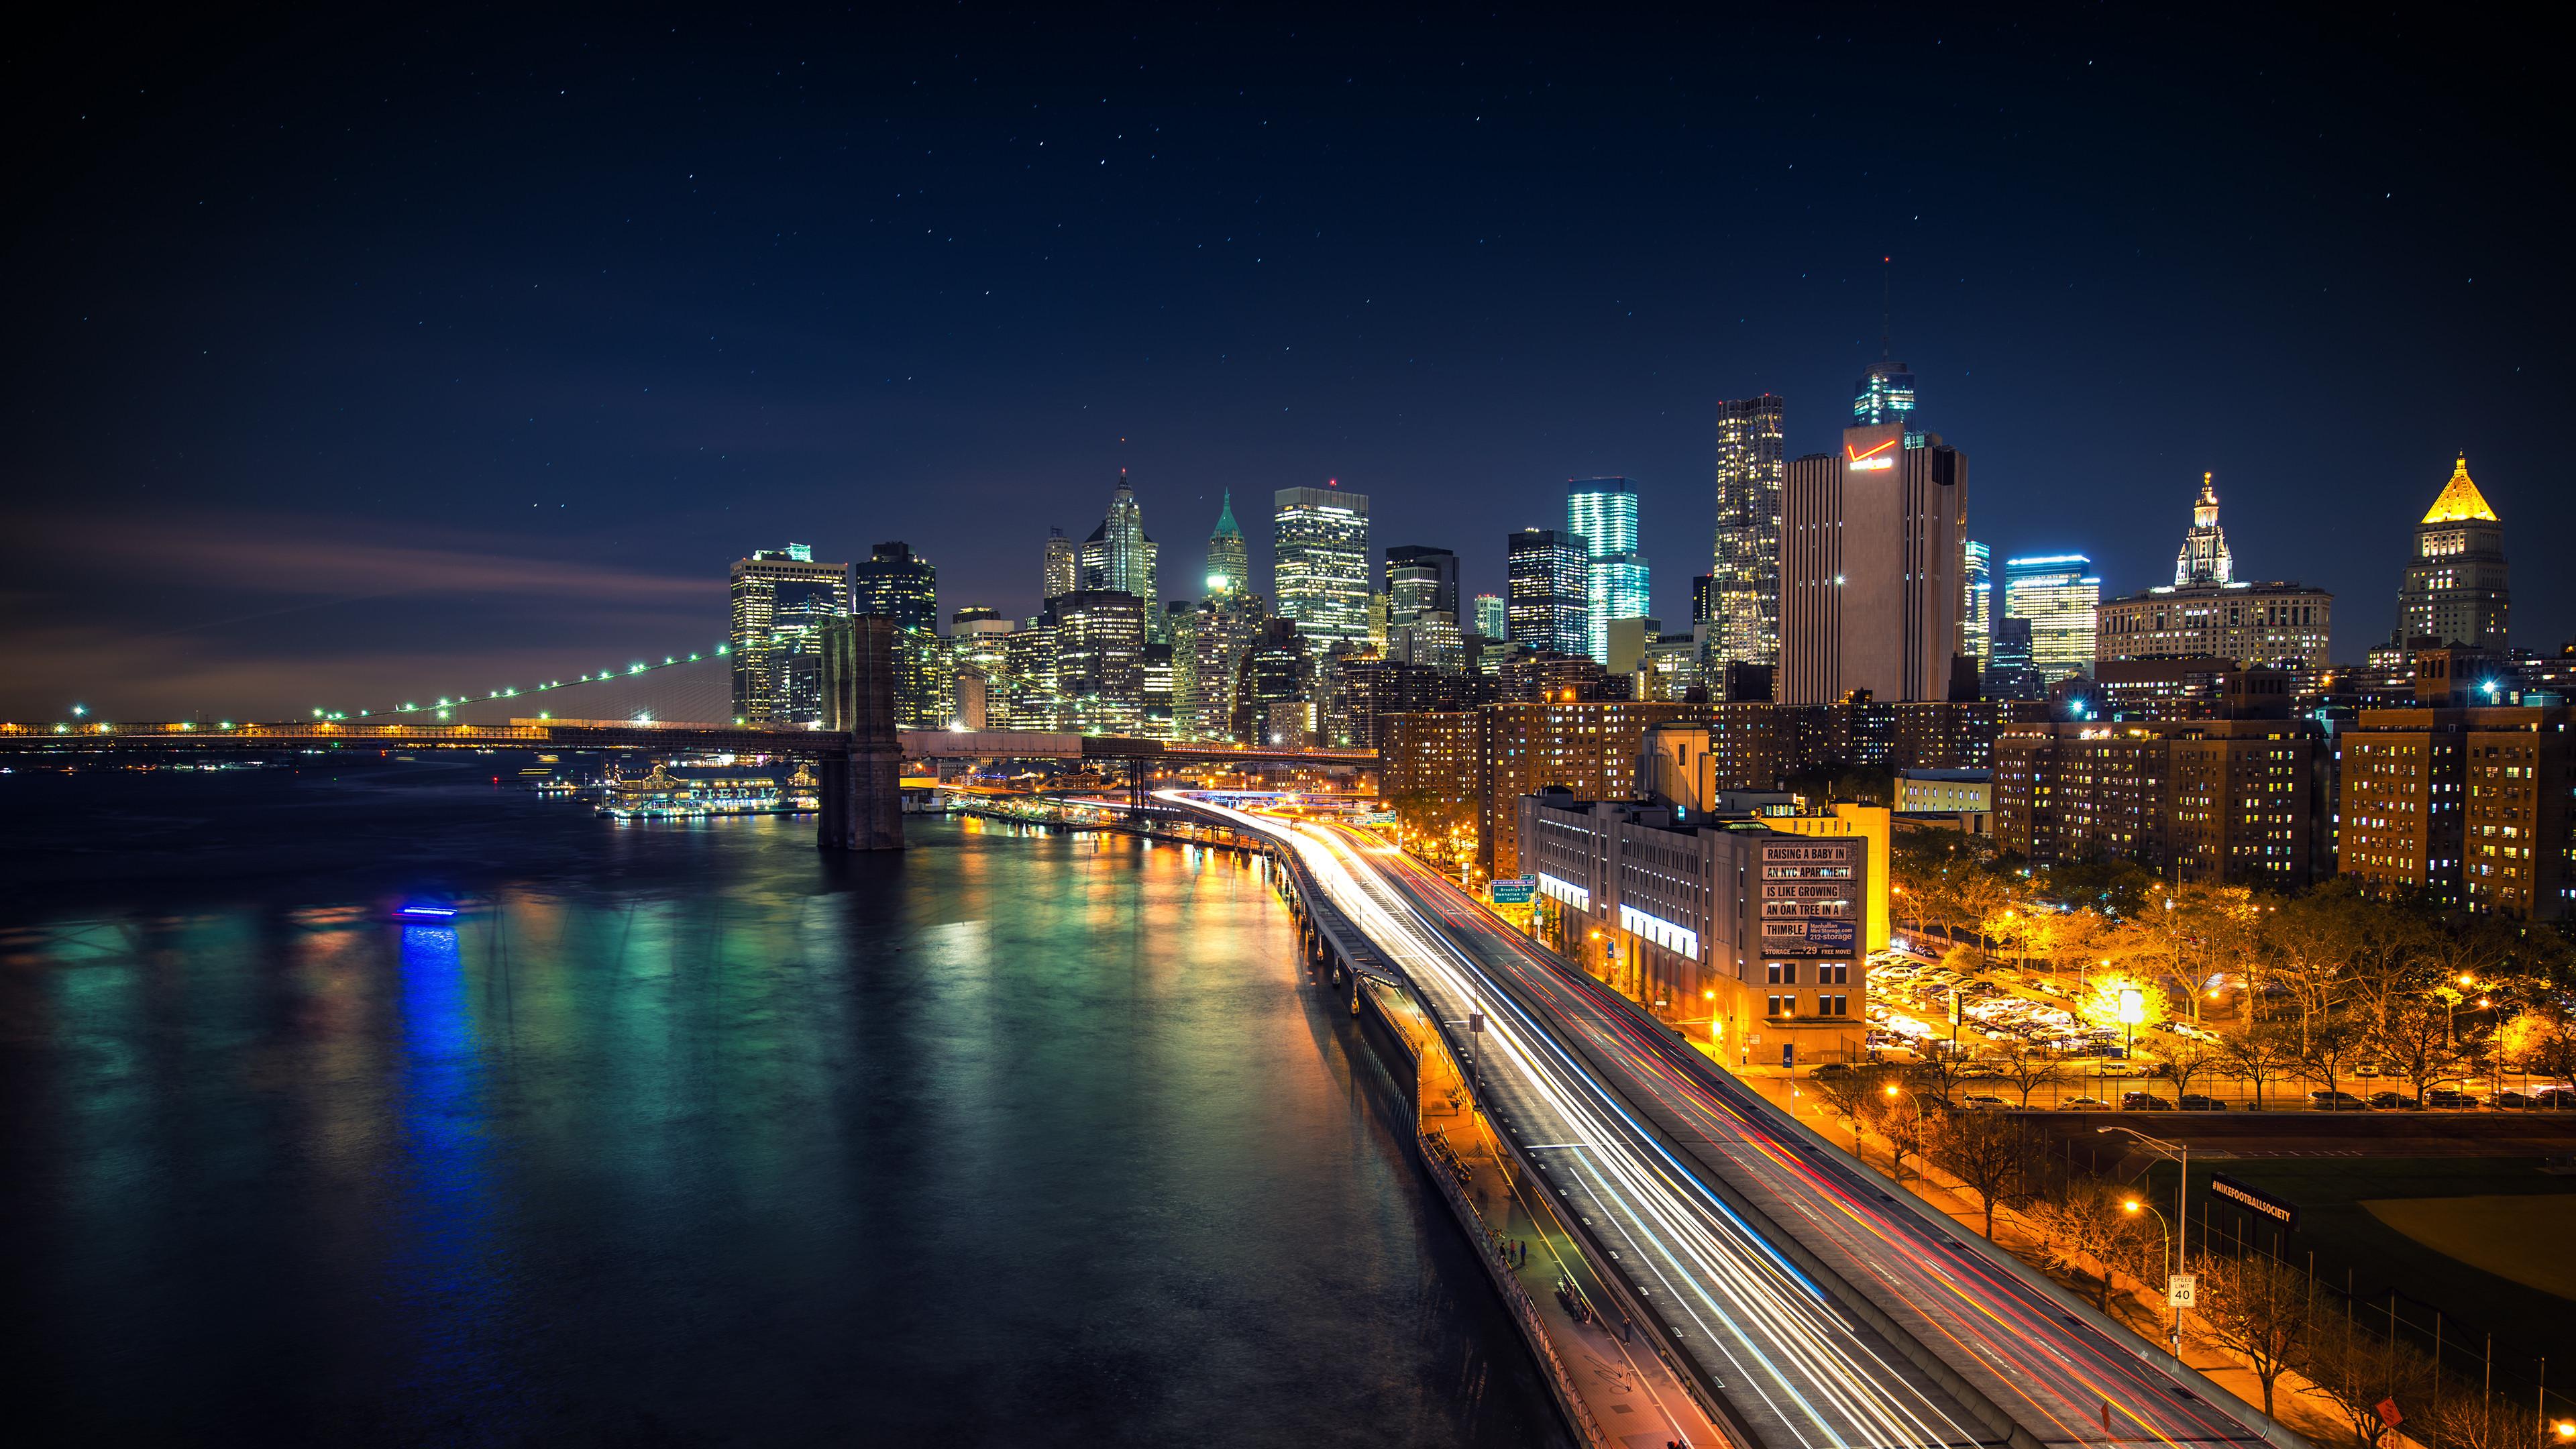 City Night Wallpaper 4k | Free Desktop Backgrounds